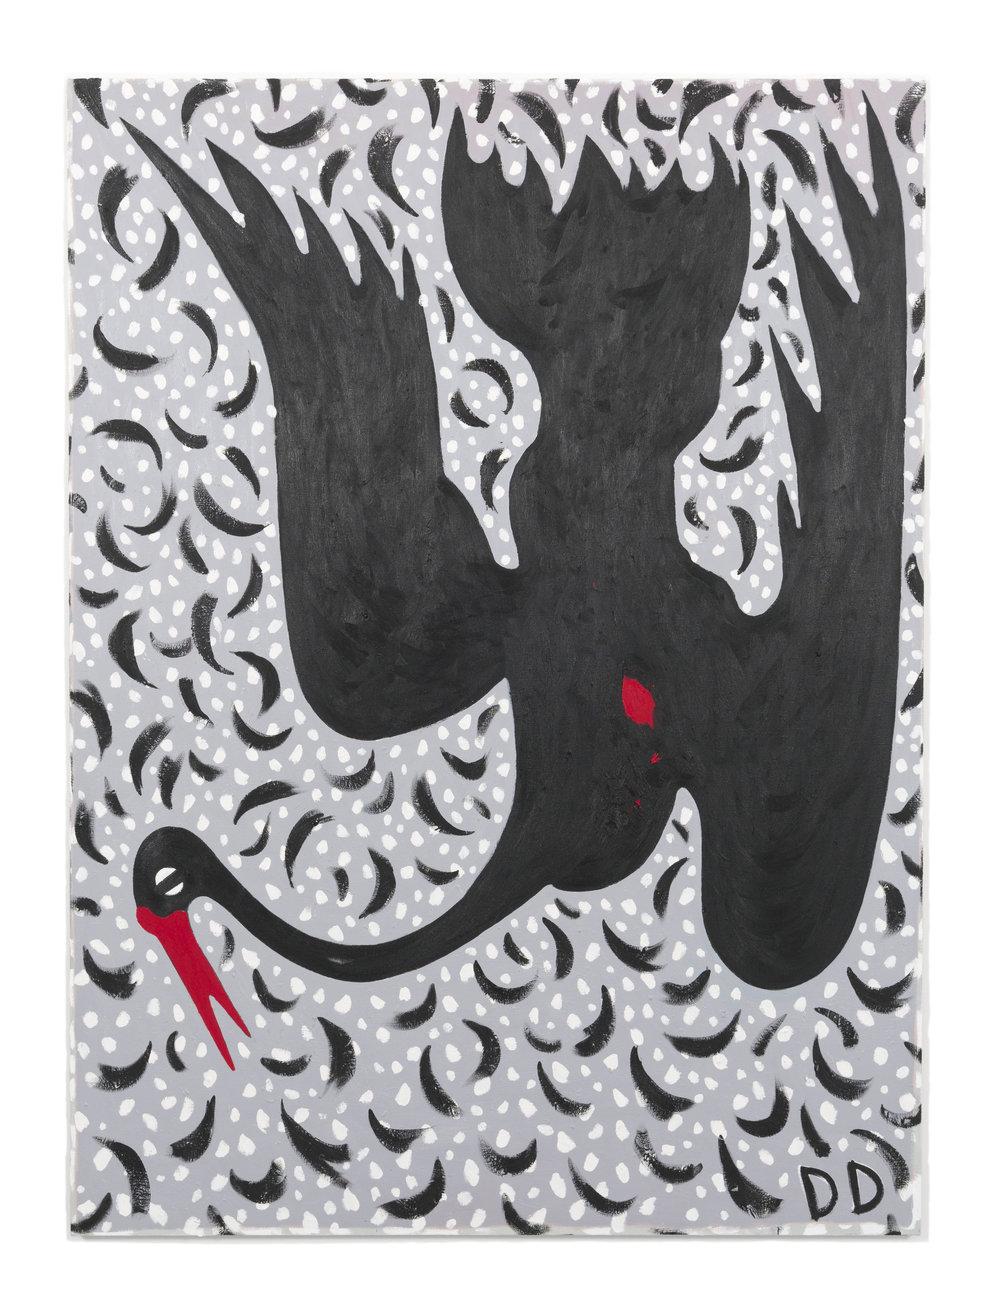 Black Swan  Oil on Flax  170 x 230 cm  2018